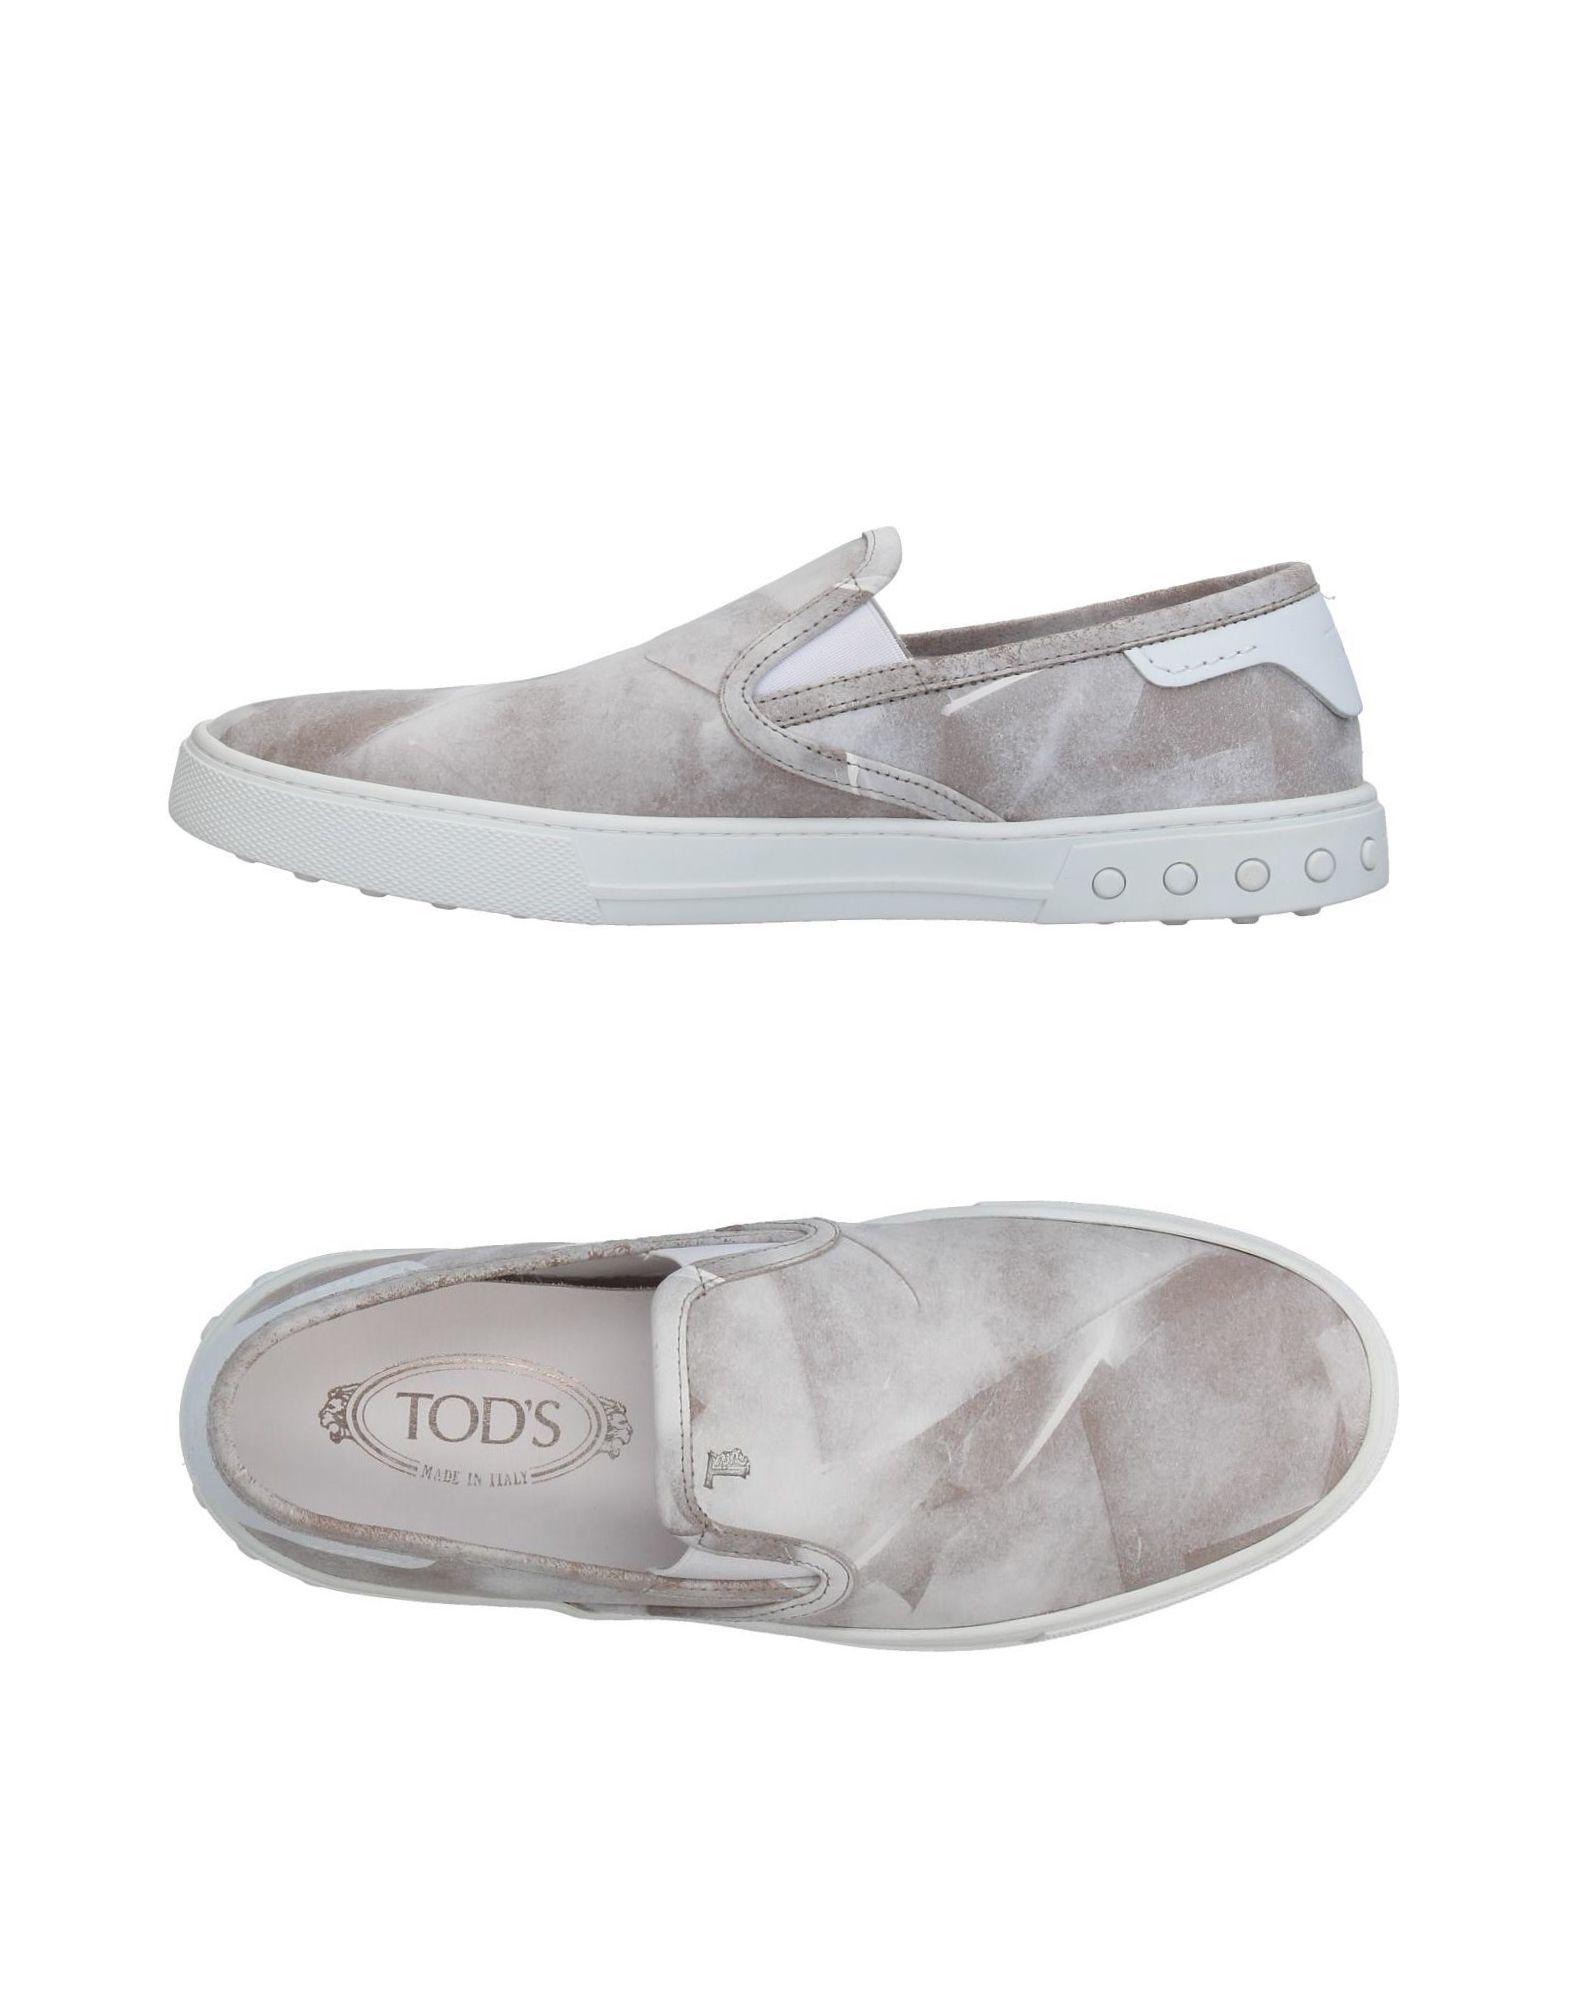 Moda Sneakers Tod's Uomo - 11398394RB